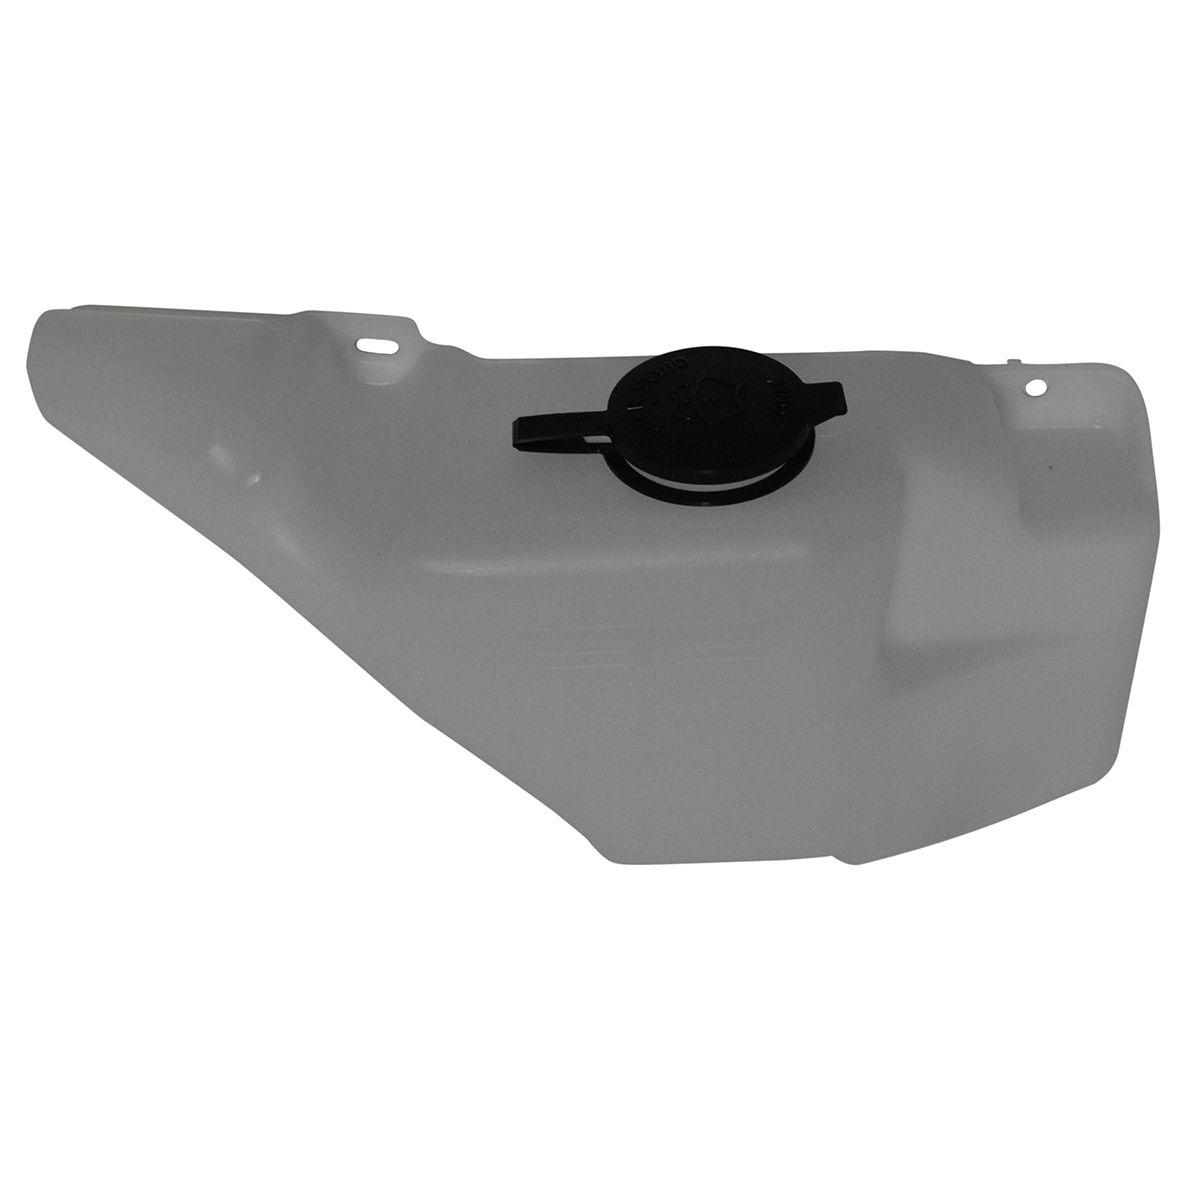 Dorman 603-167 Washer Fluid Reservoir